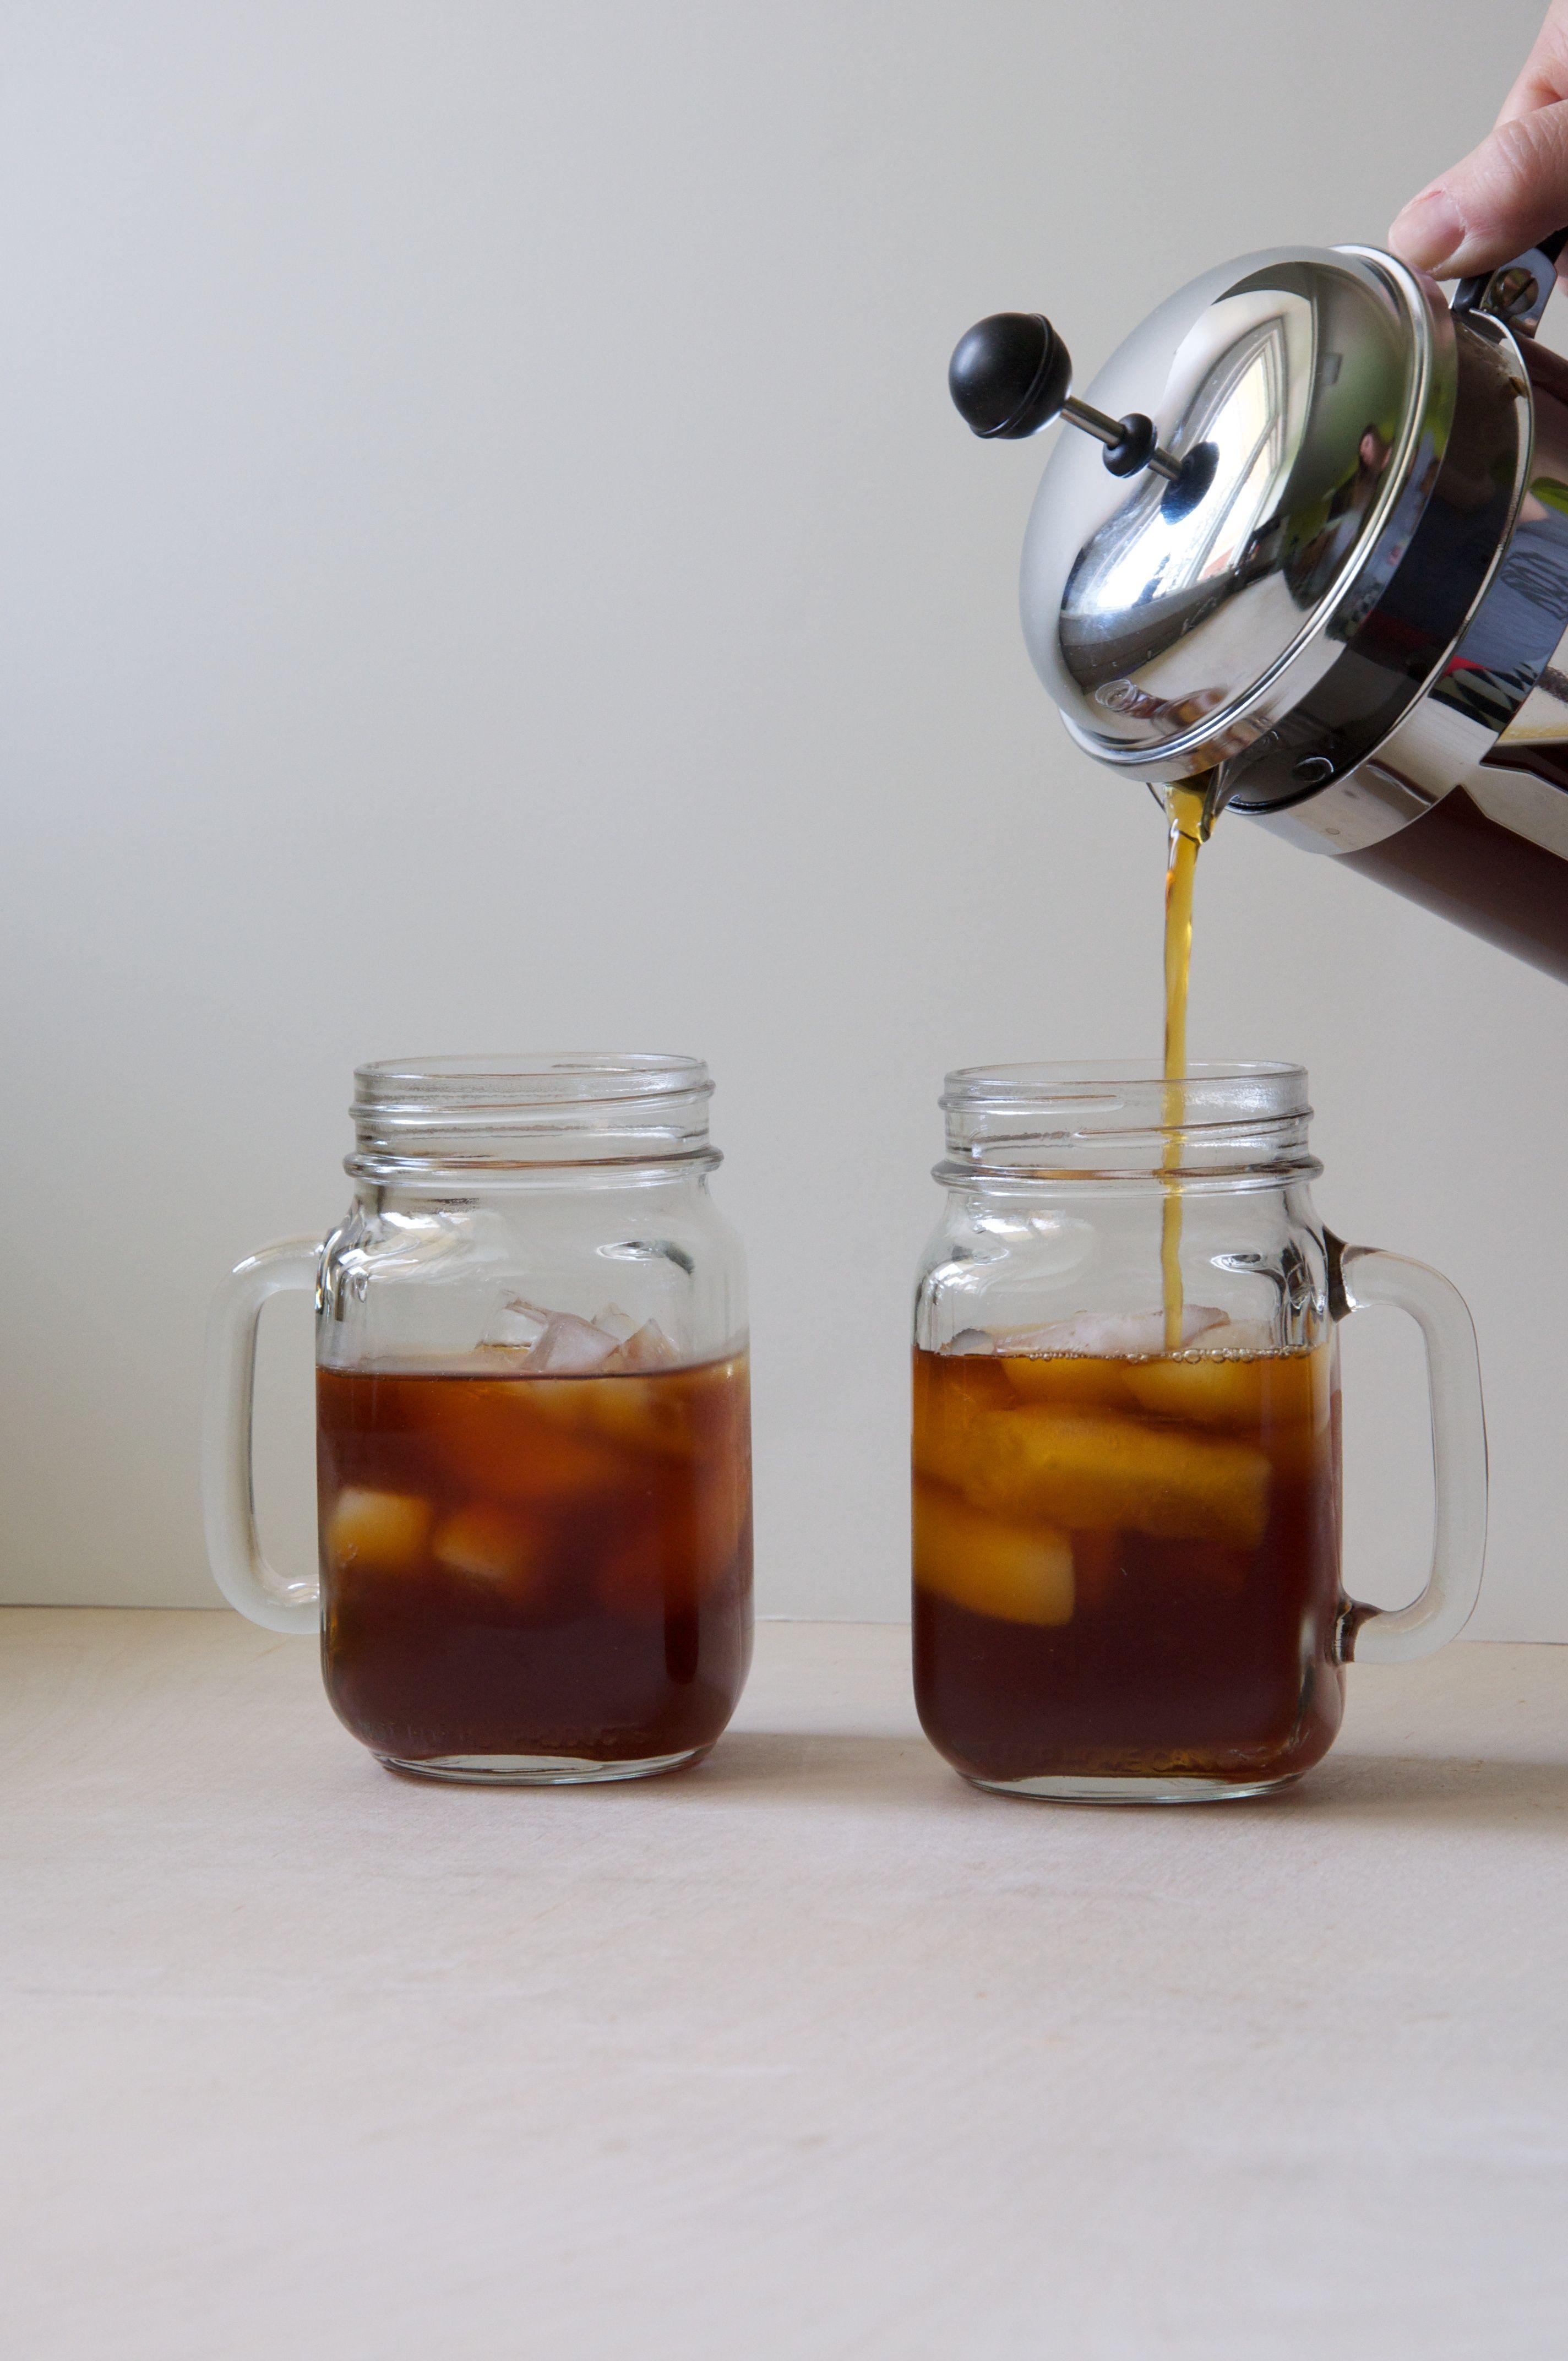 French press cold brew coffee with vanilla bean coconut